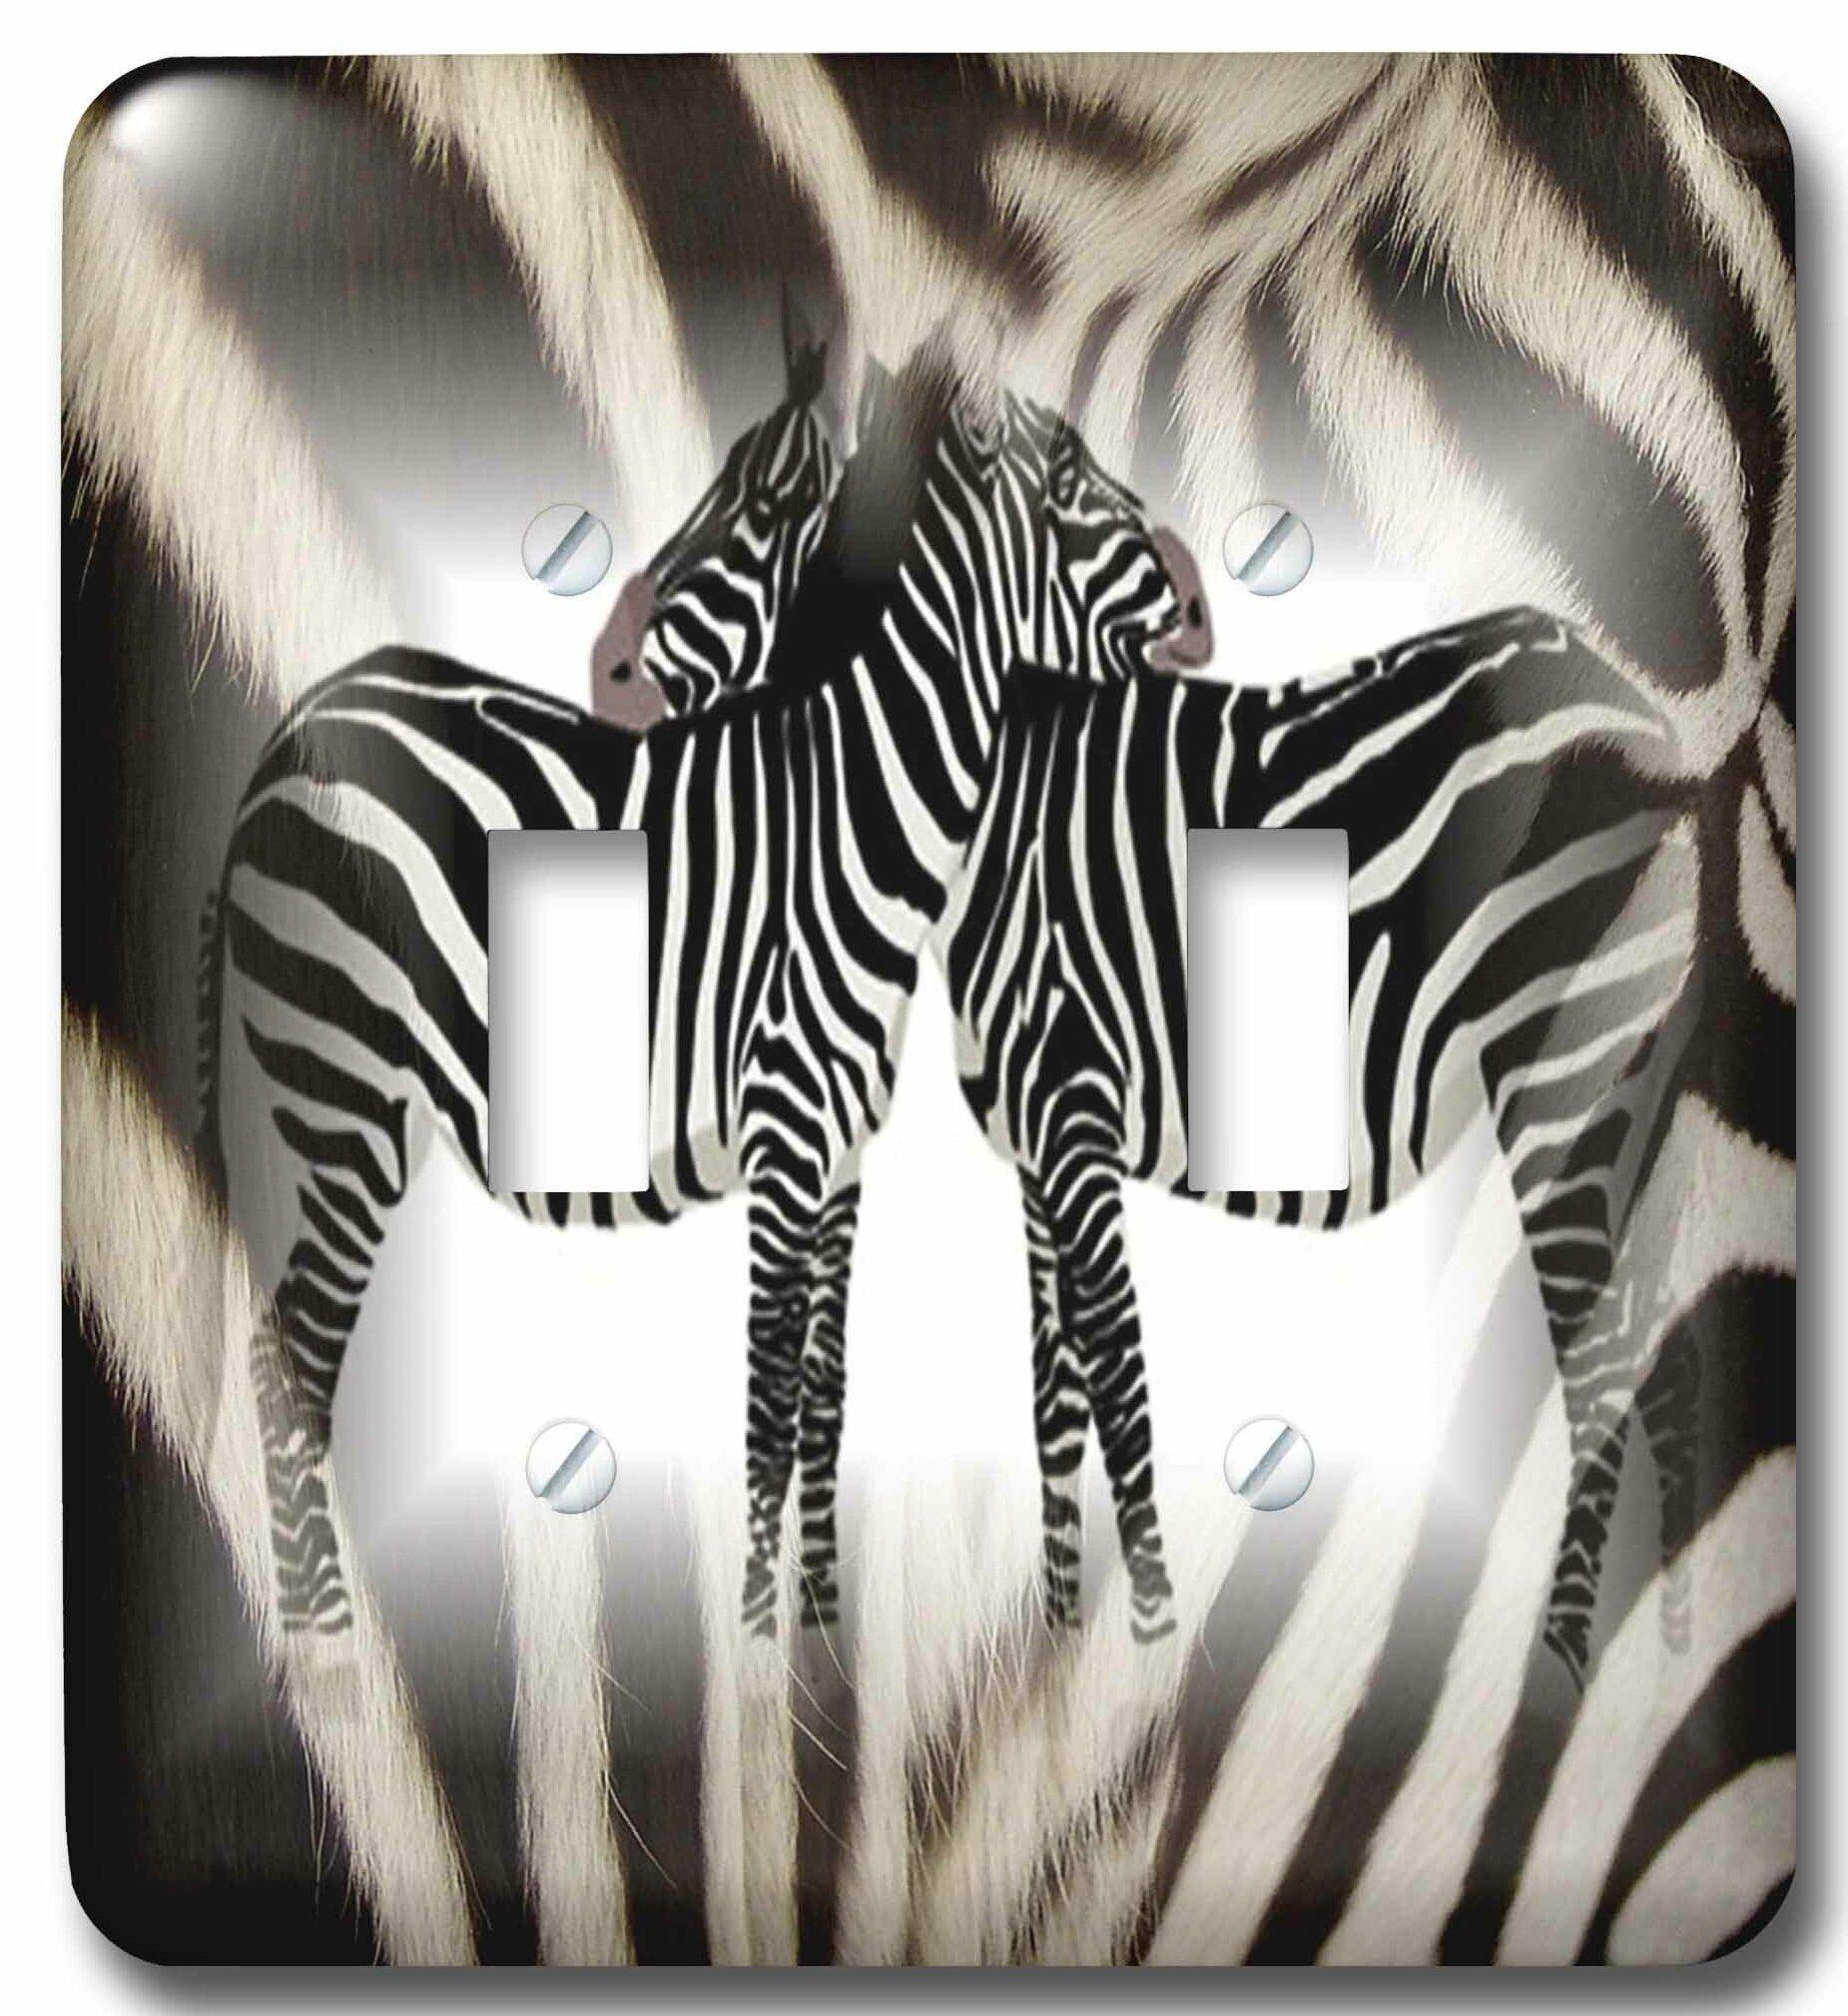 3drose 2 Hugging Zebras On Real Zebra Fur 2 Gang Toggle Light Switch Wall Plate Wayfair